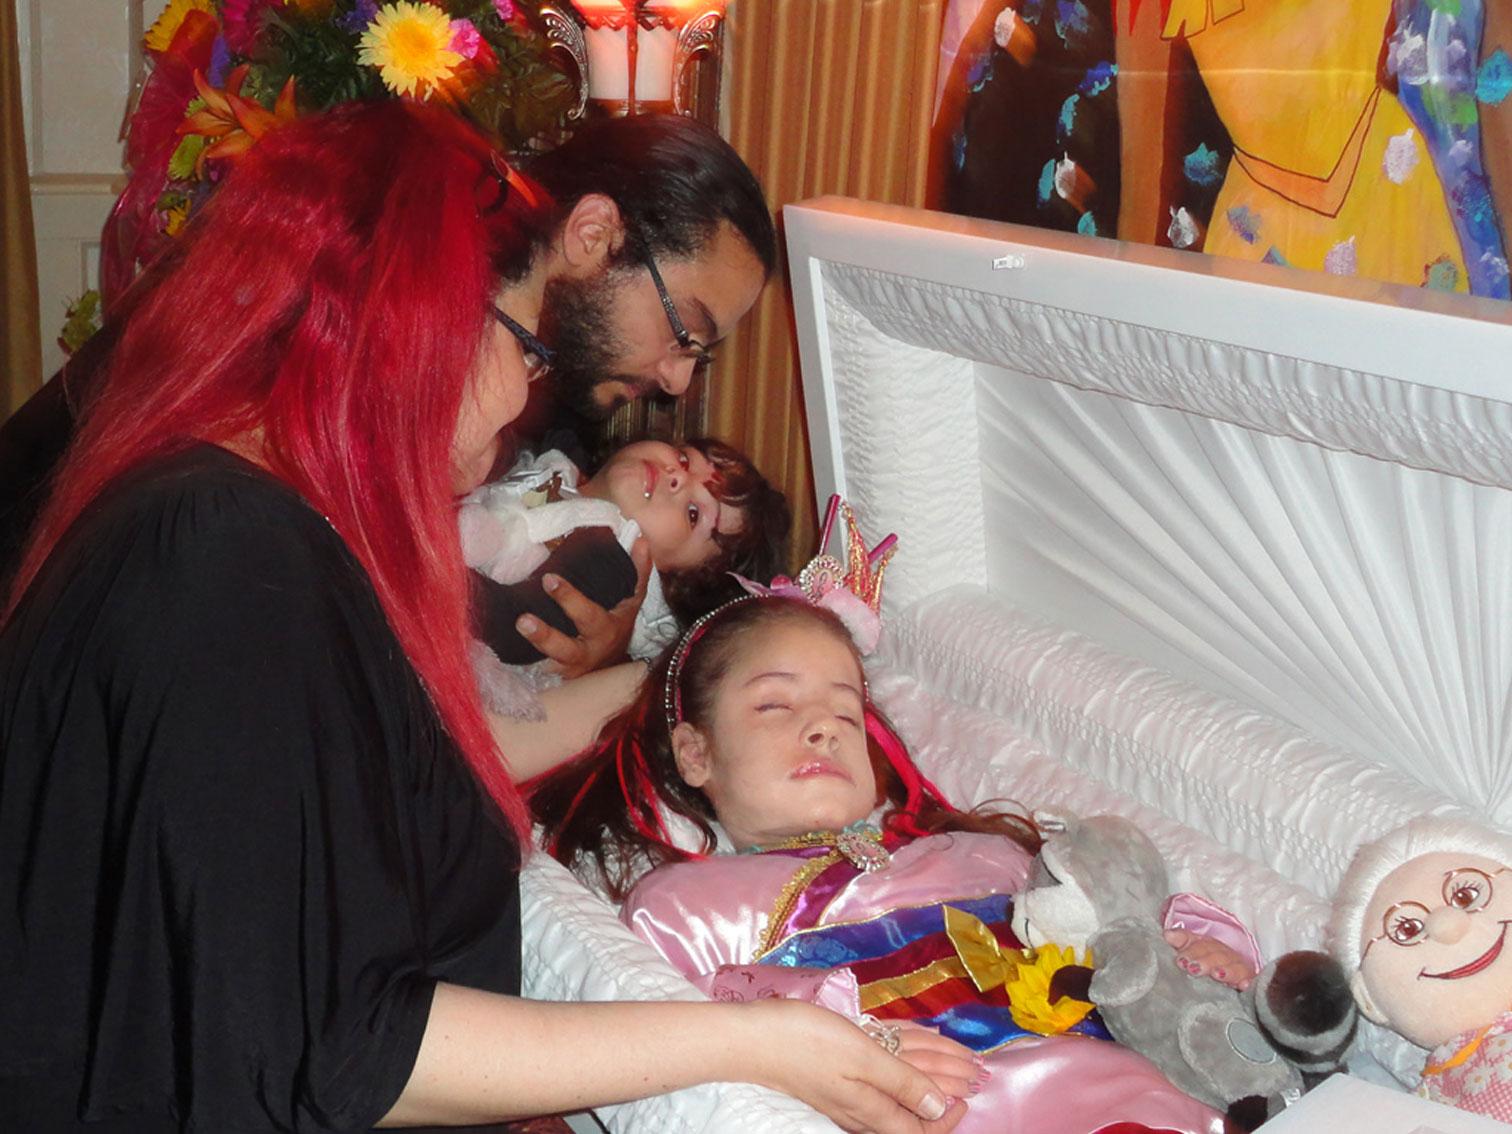 DEIRDRE MEDINA\'s DIARY: A LITTLE MAGE in the FAMILY: November 2012